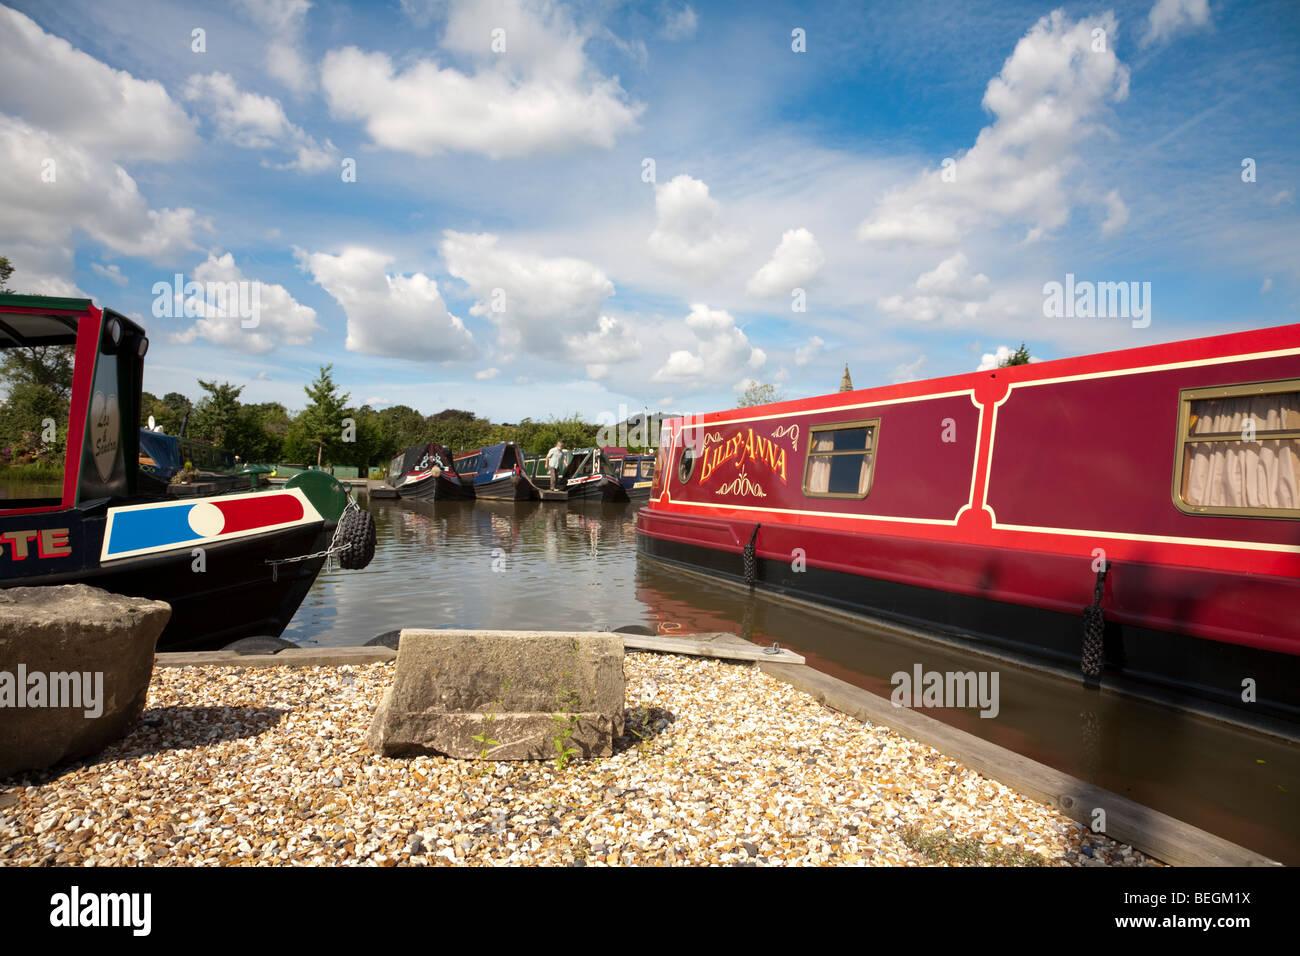 Narrowboats in Rufford - Stock Image